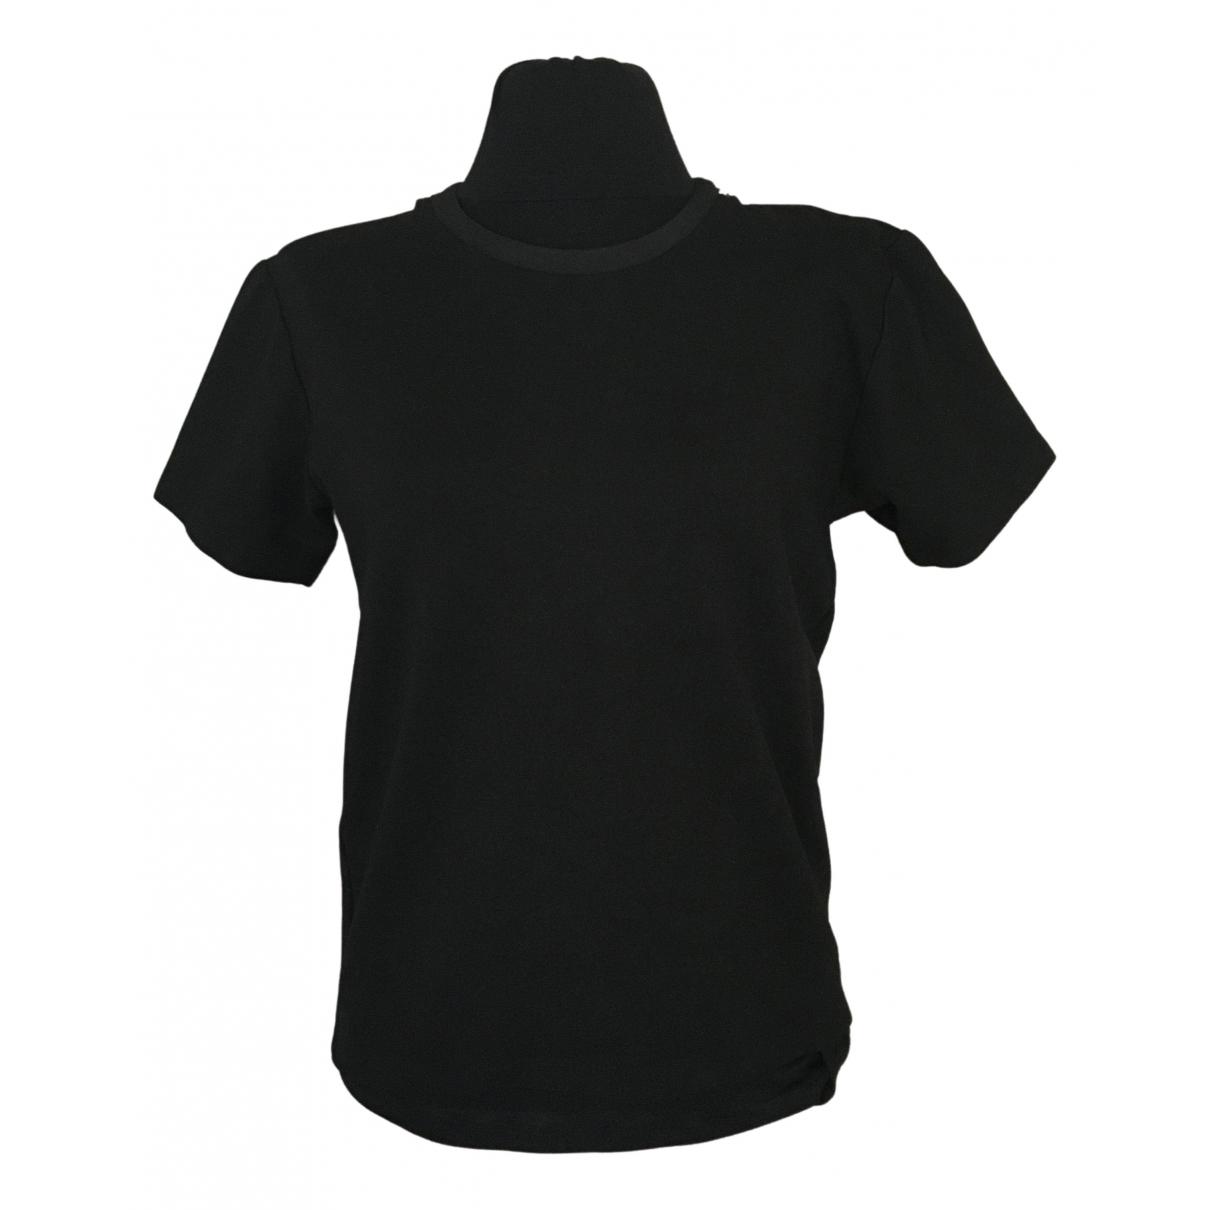 Mcq N Black Knitwear for Women M International